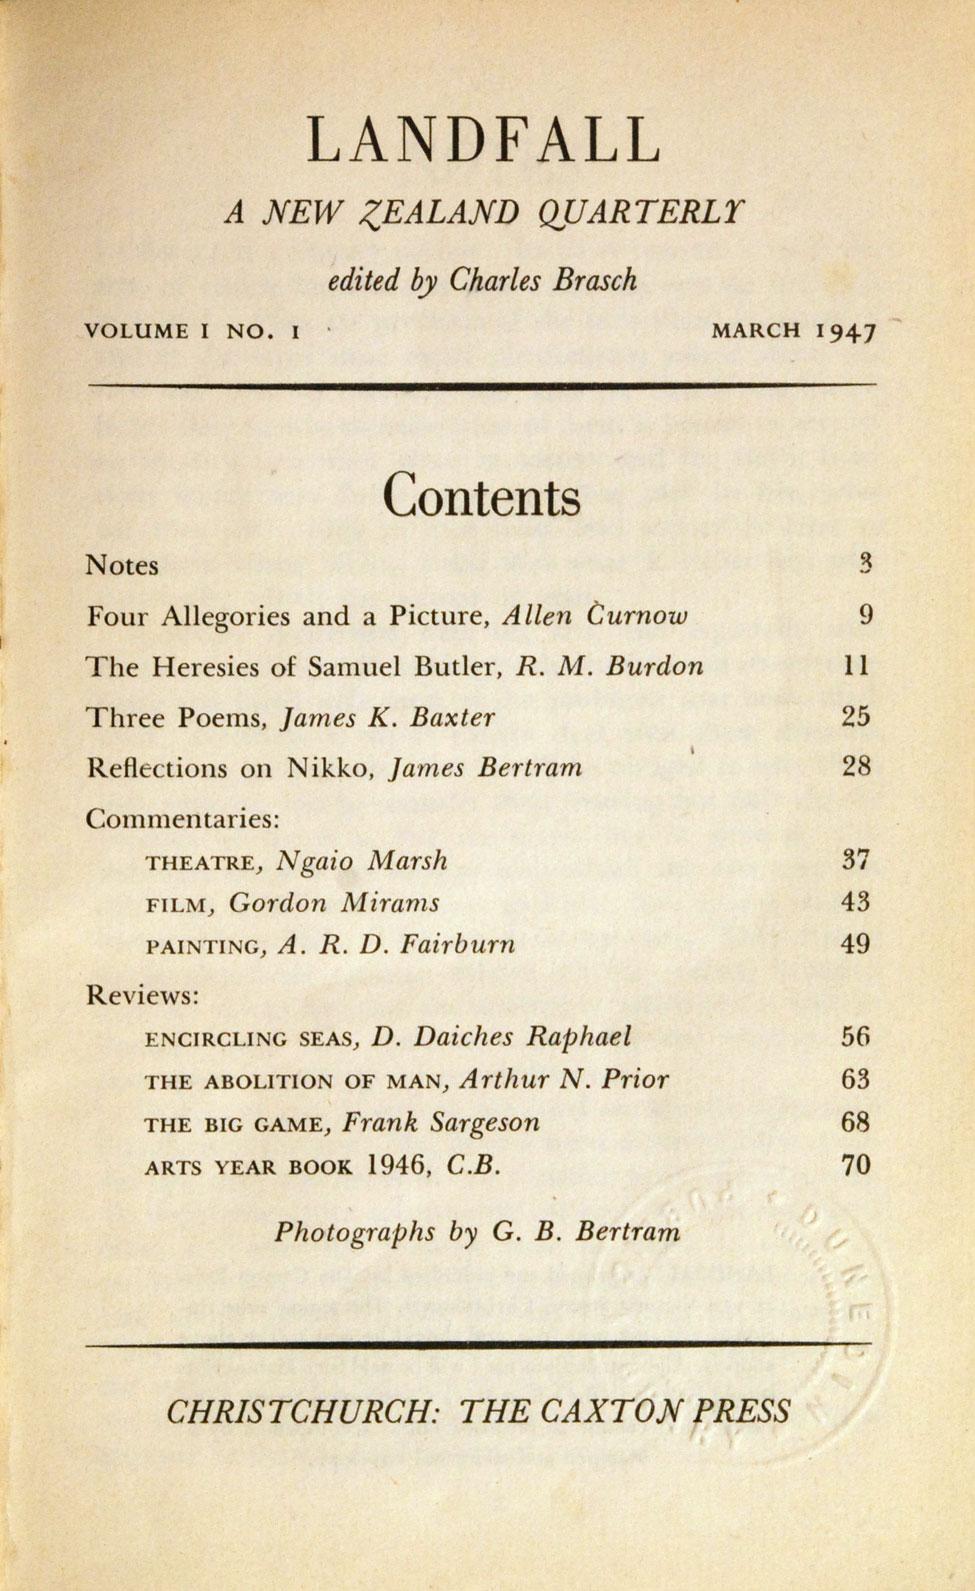 Charles Brasch (ed.). Landfall: A New Zealand Quarterly, Vol. 1 No. 1. <i>Christchurch: The Caxton Press, March 1947.</i>